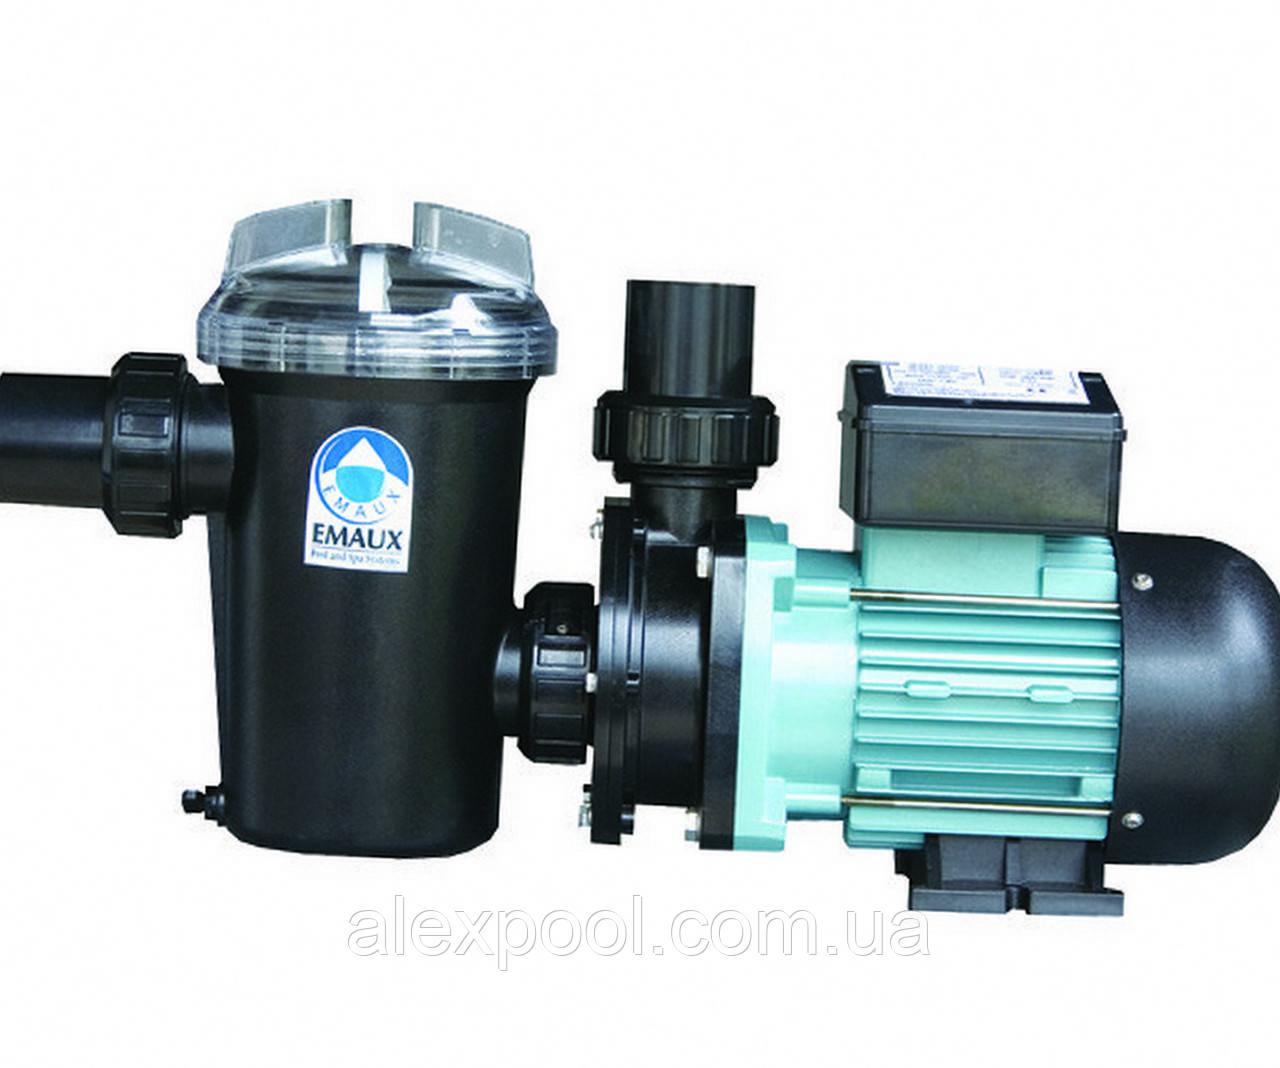 Emaux SD075 Насос для бассейна (SD 075, 10.5 м. куб/час, 0,75 кВт, 0,75 HP, 220В )